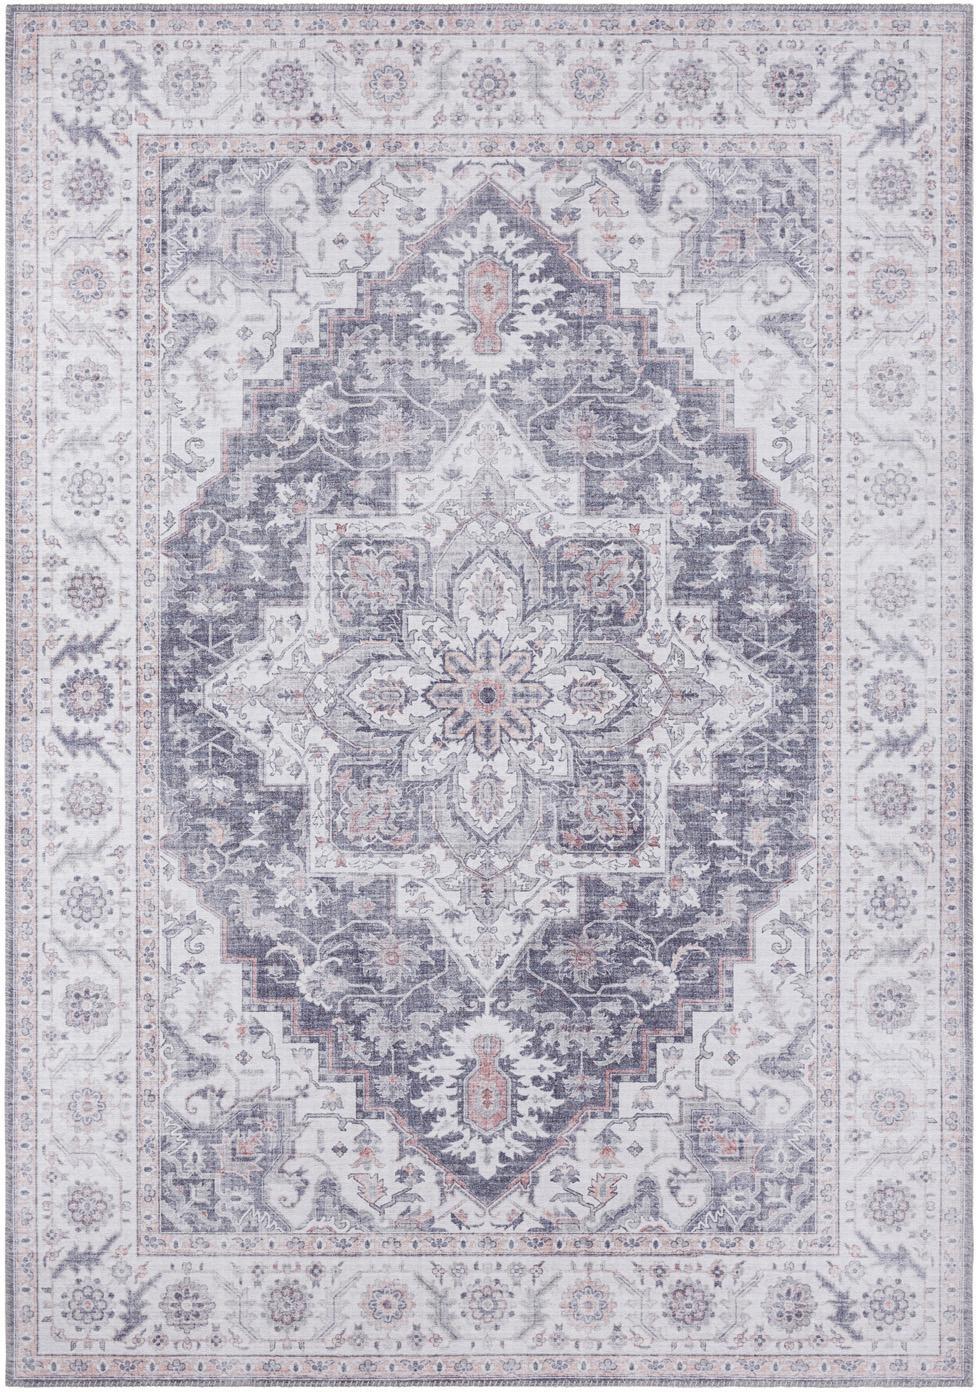 Teppich Anthea im Vintage Style, Blau-Grau, Mauve, B 120 x L 160 cm (Größe S)